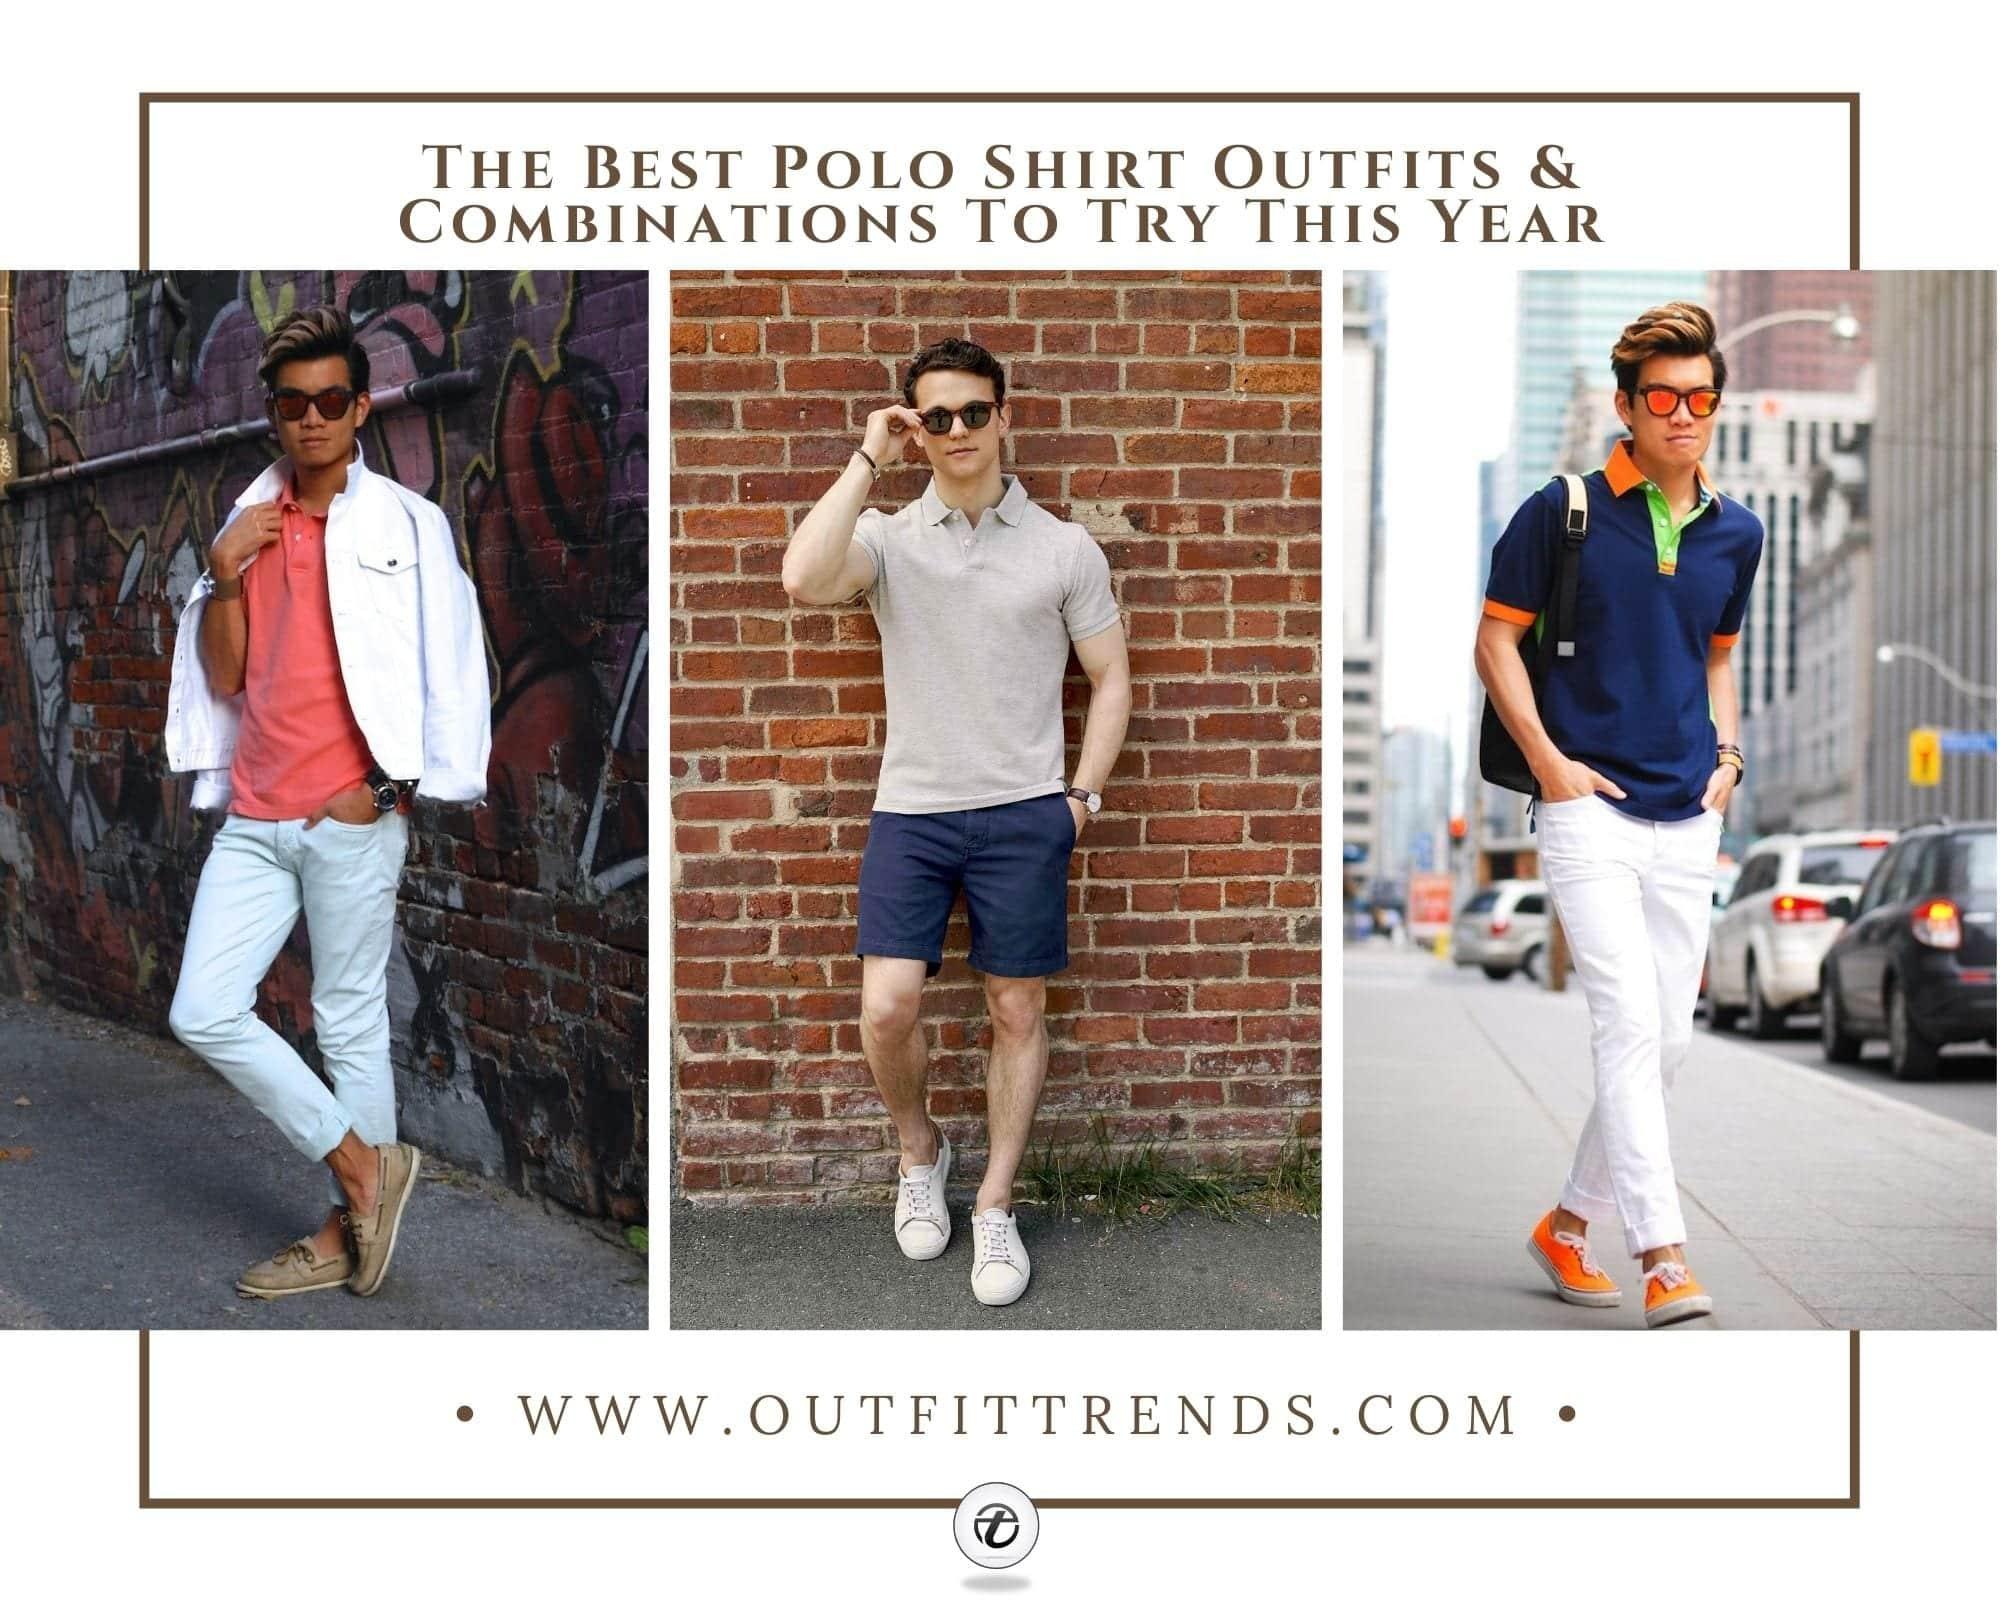 Men's Polo Shirt Outfits: 35 Modern Ways to Wear Polo Shirts